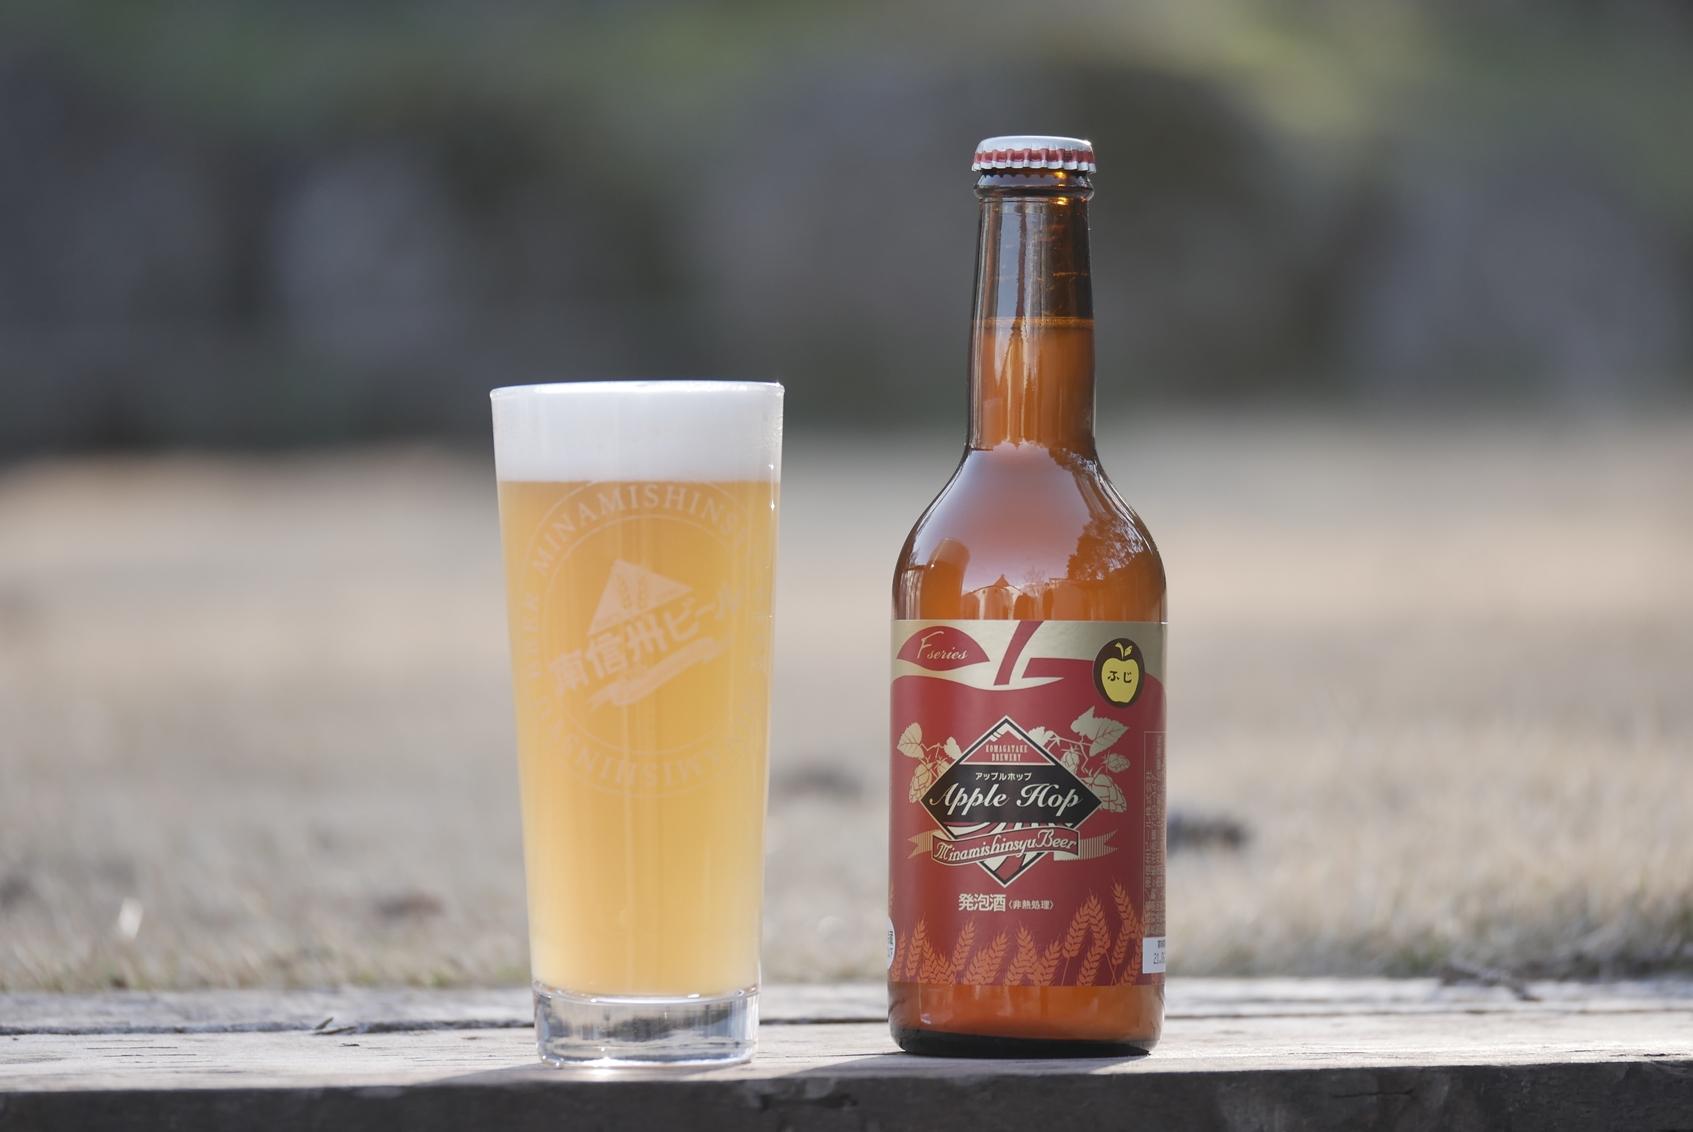 【DREAMBEERで飲めるビール】南信州産のフレッシュなりんごを存分に楽しめる『アップルホップ』